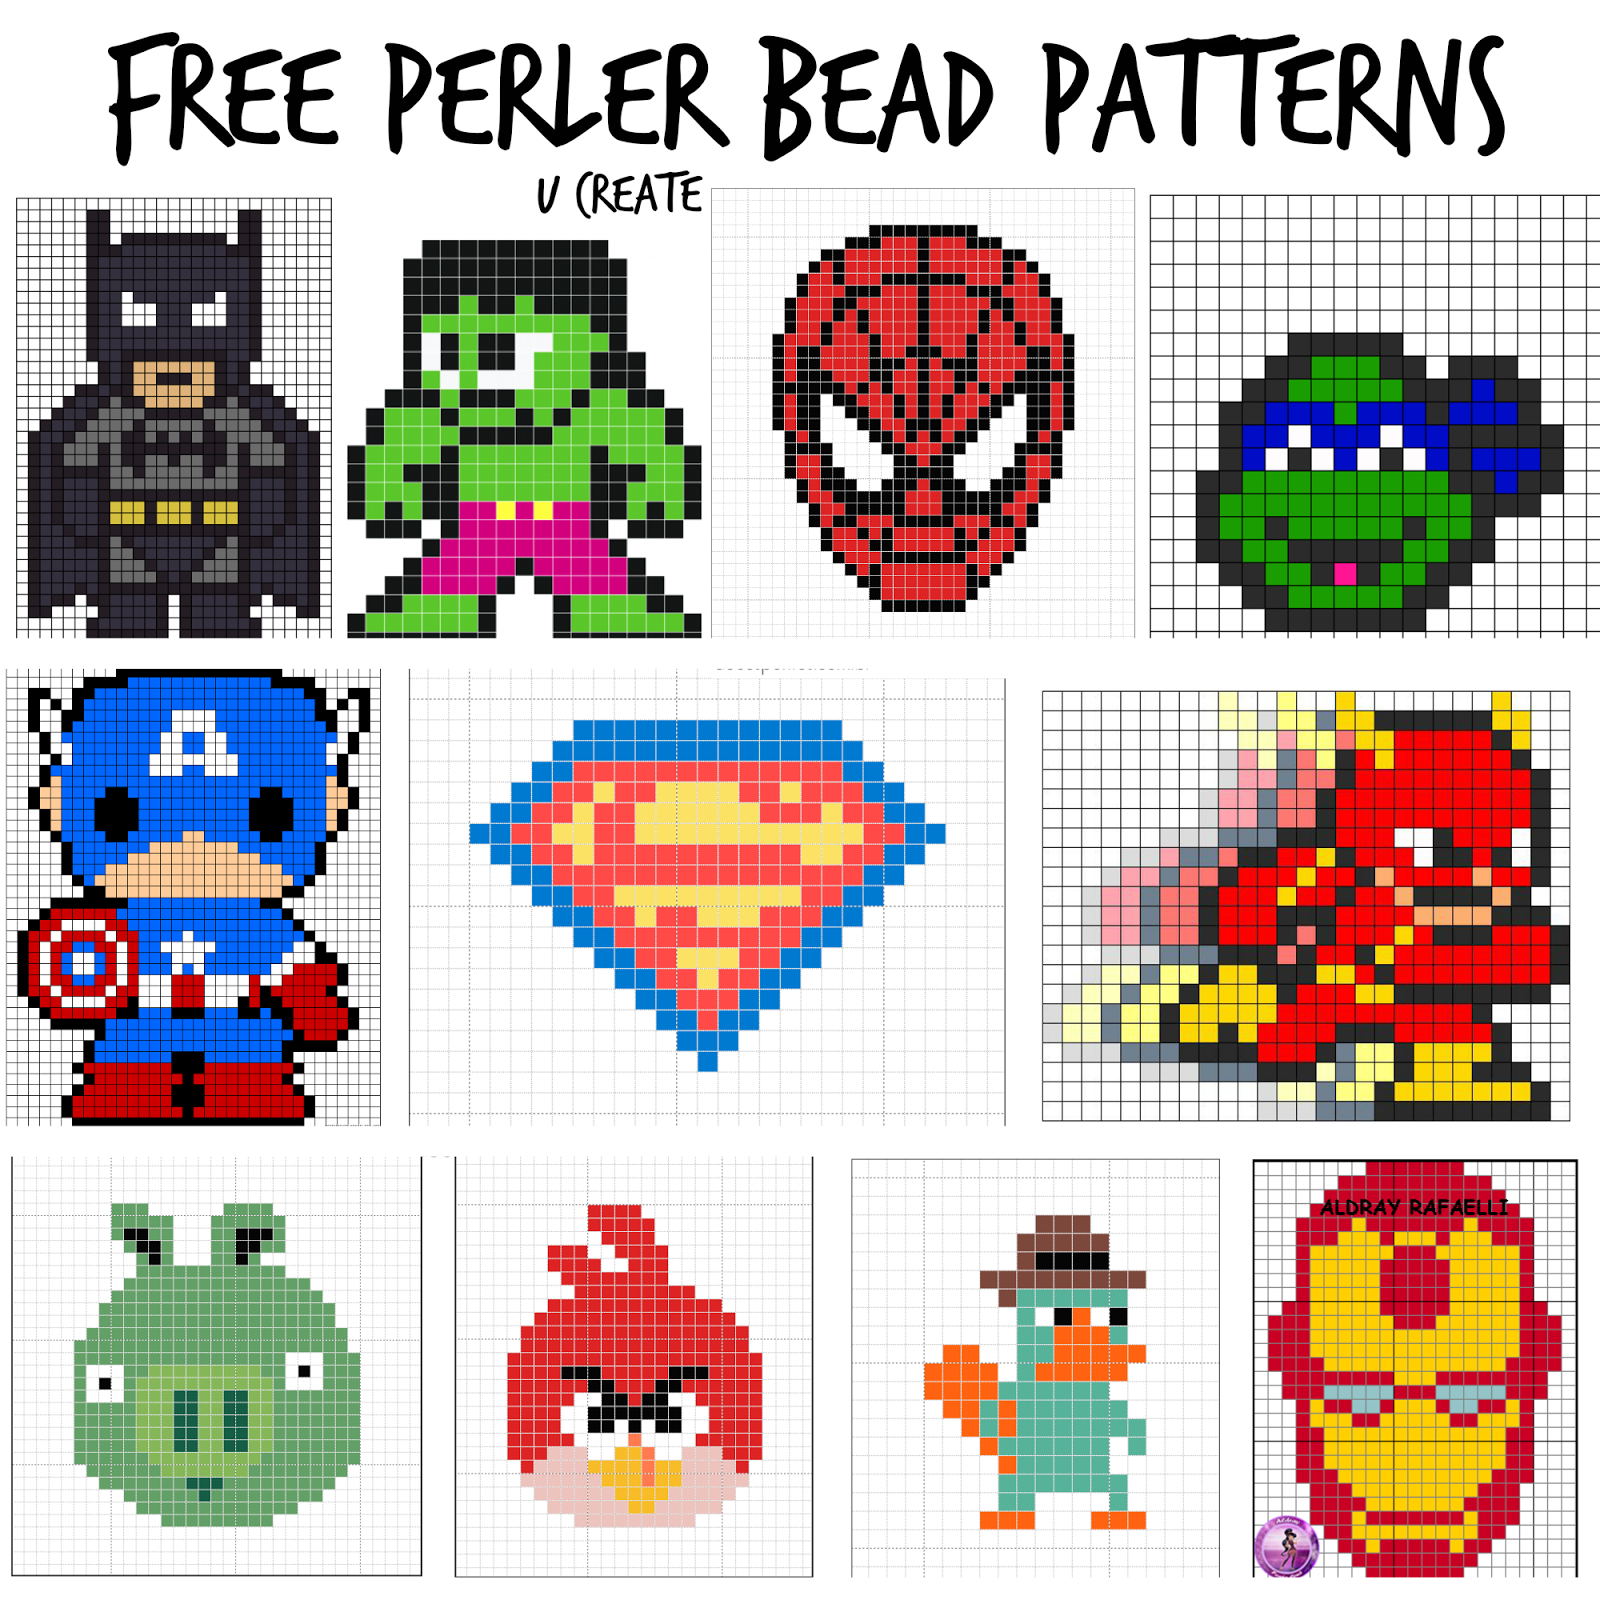 Free Perler Bead Patterns For Kids Kids Crafts Pinterest